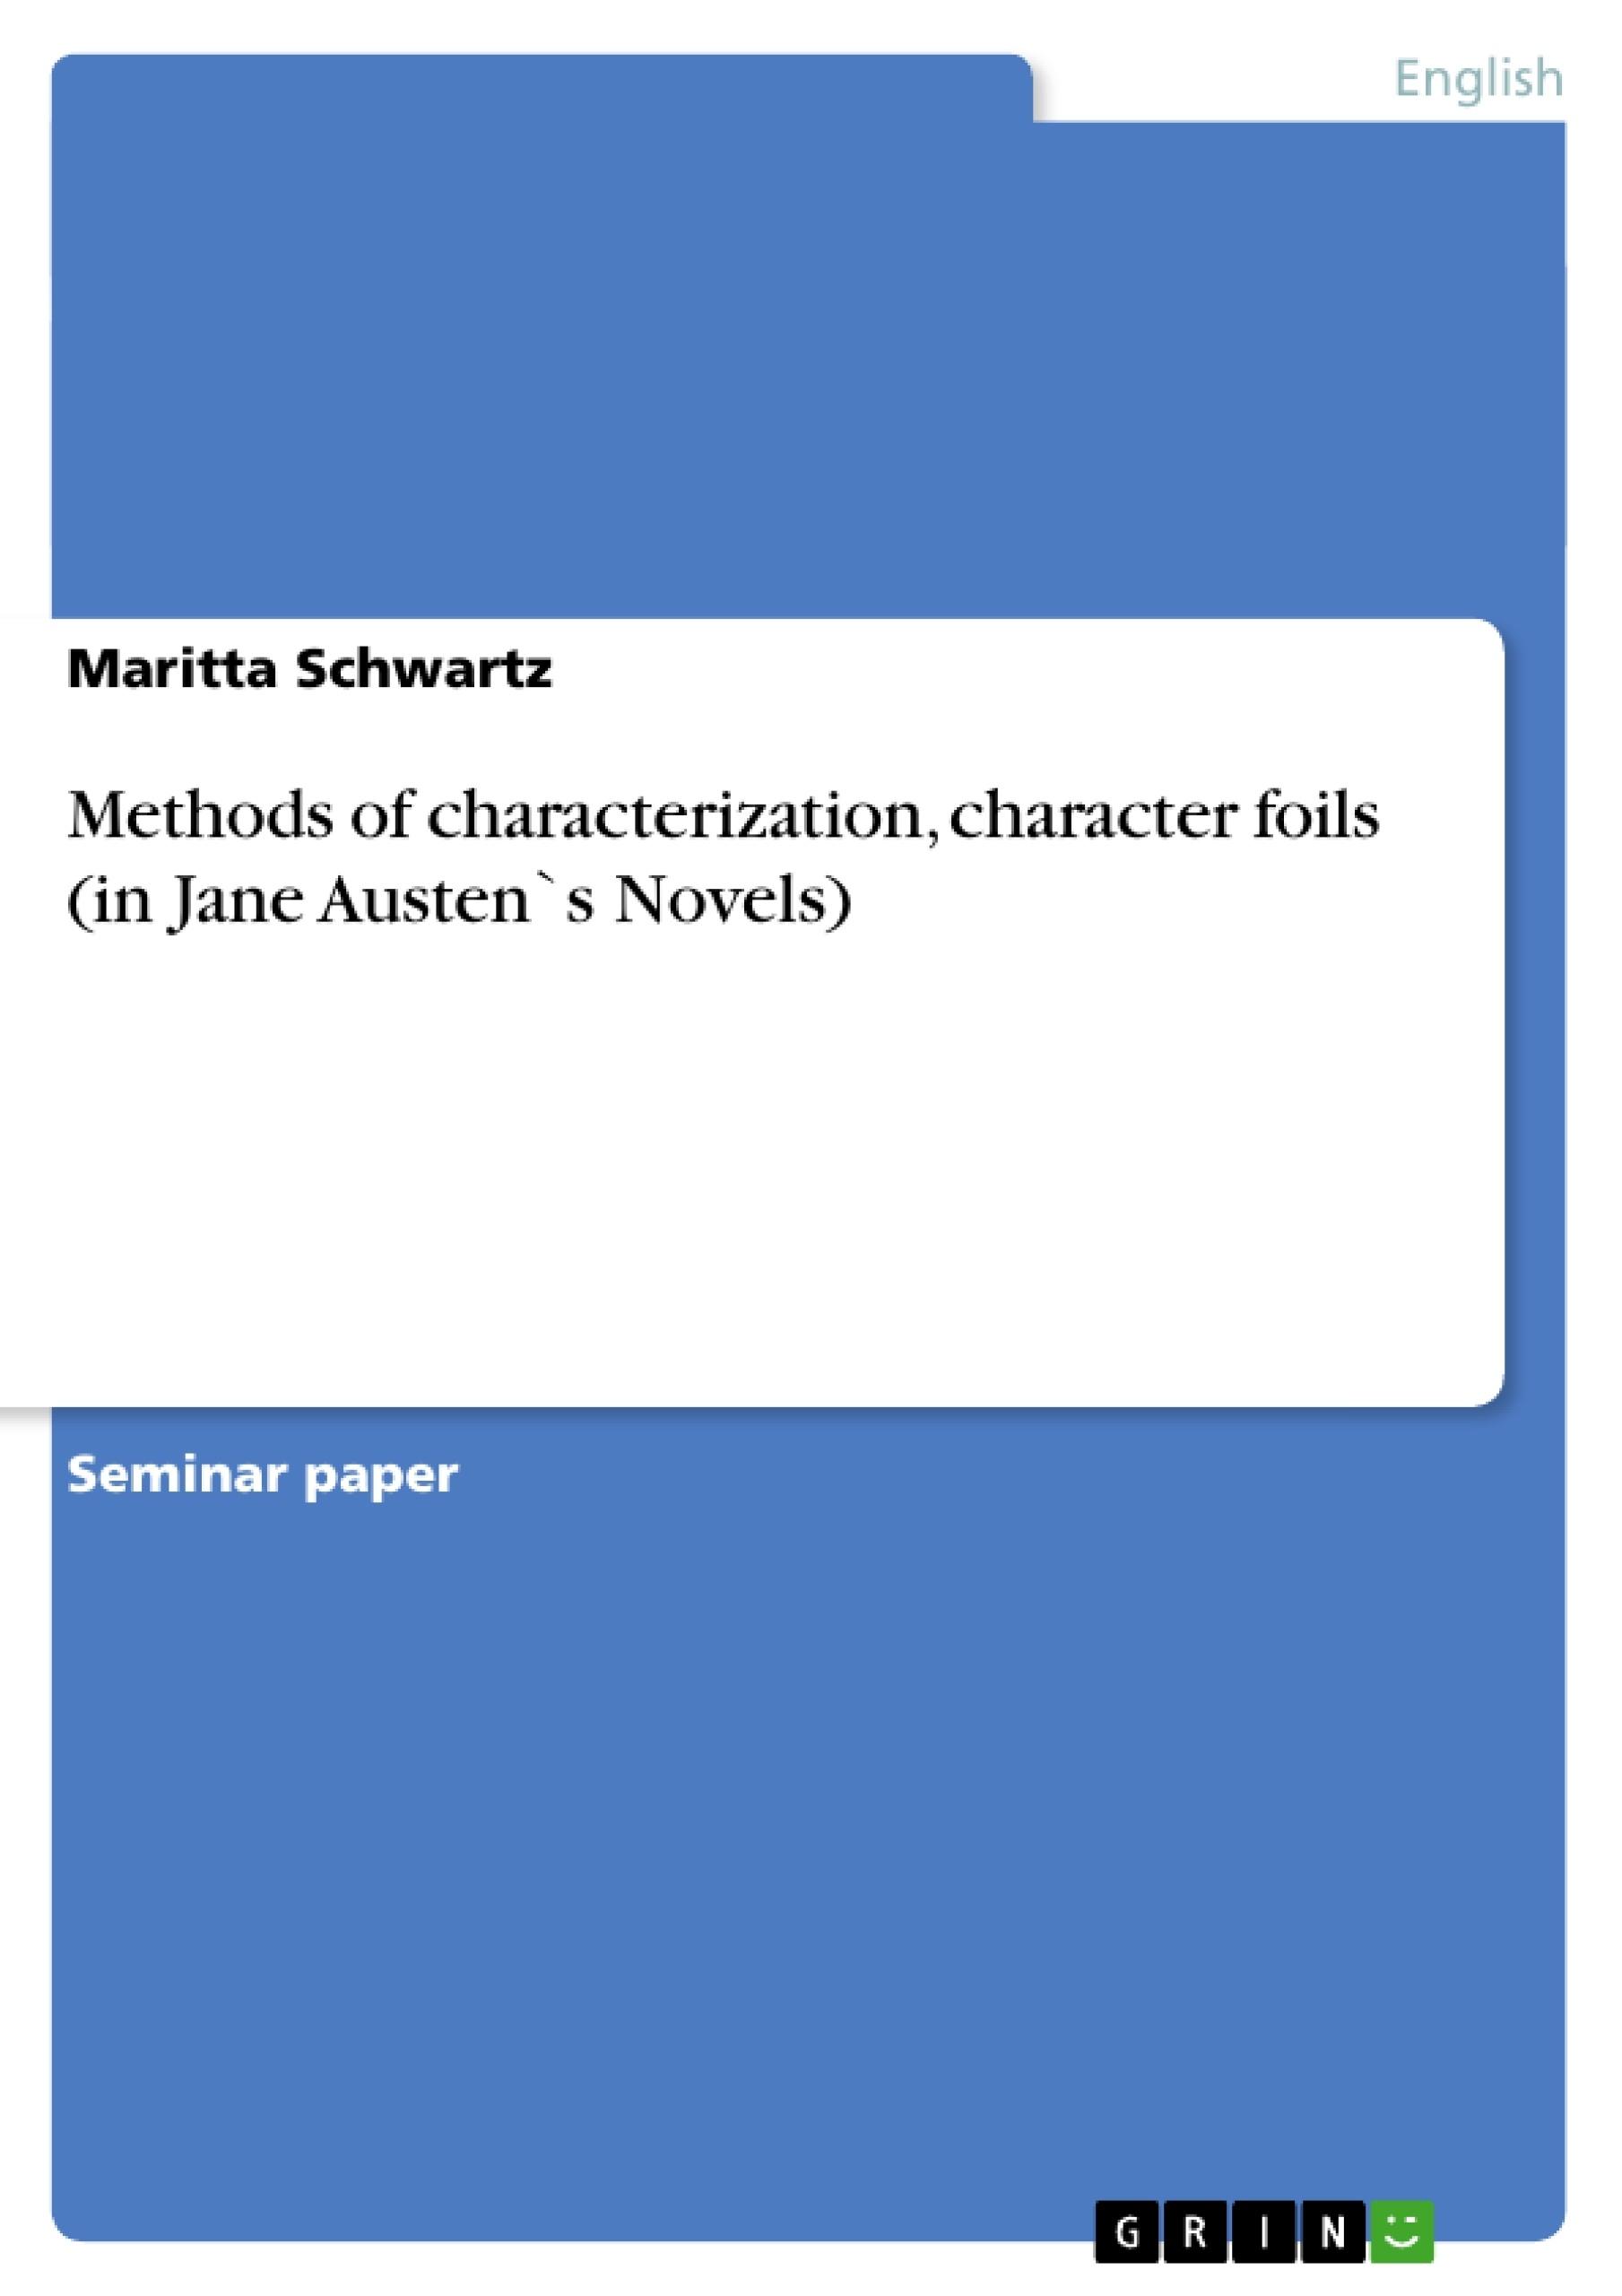 Title: Methods of characterization, character foils (in Jane Austen`s Novels)